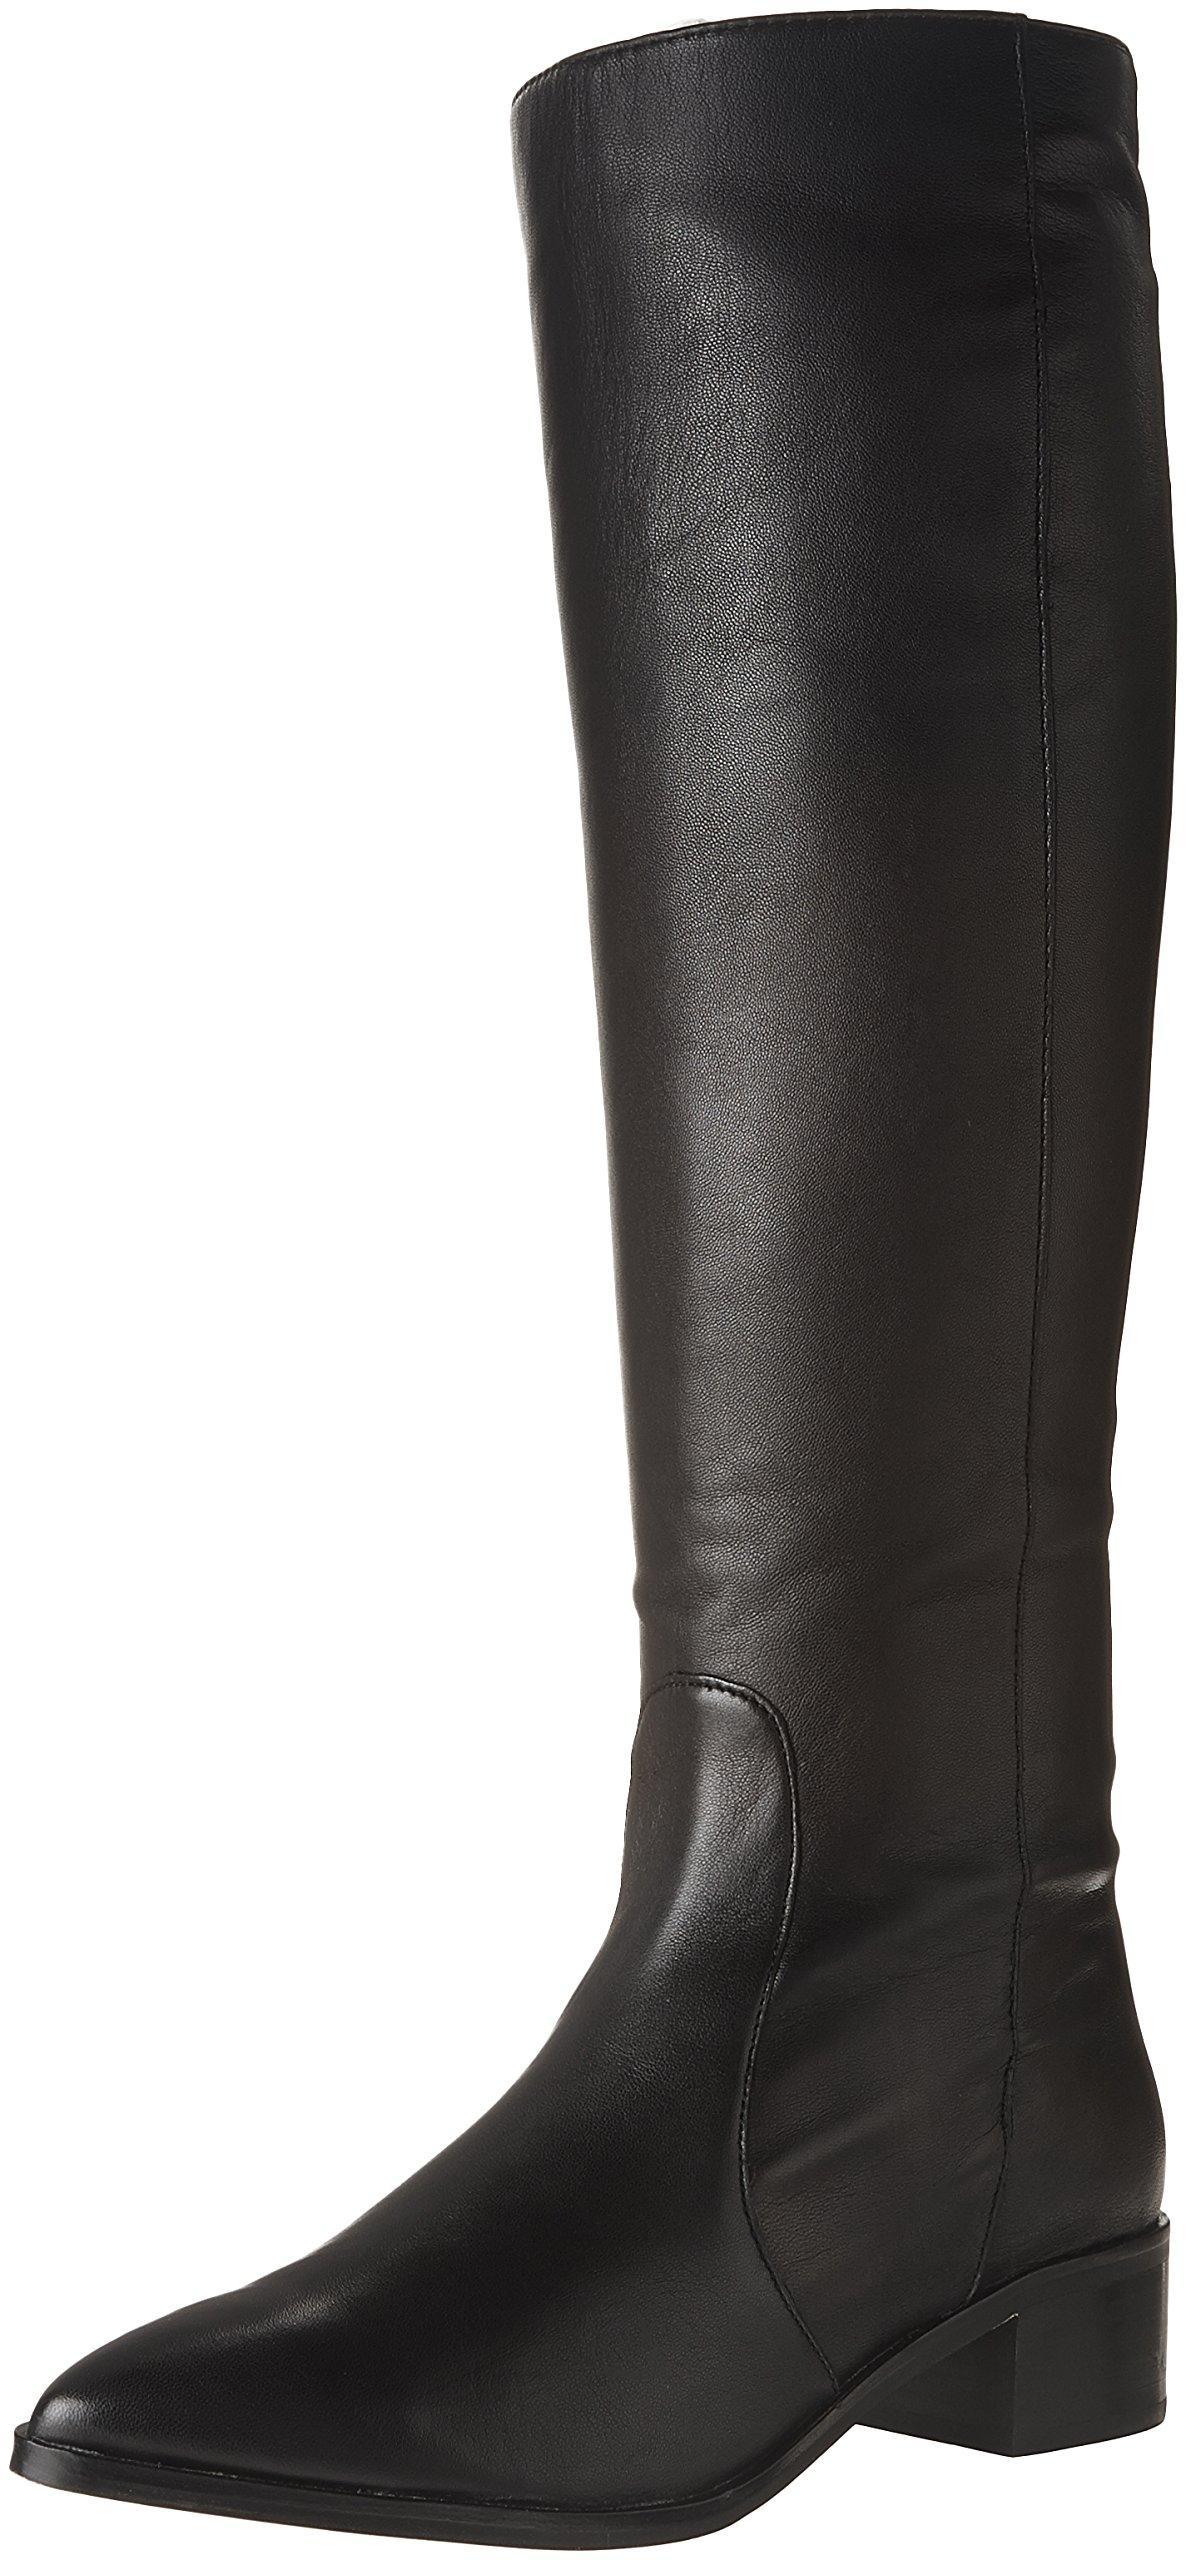 Dolce Vita Women's Morey Fashion Boot, Black Leather, 10 Medium US